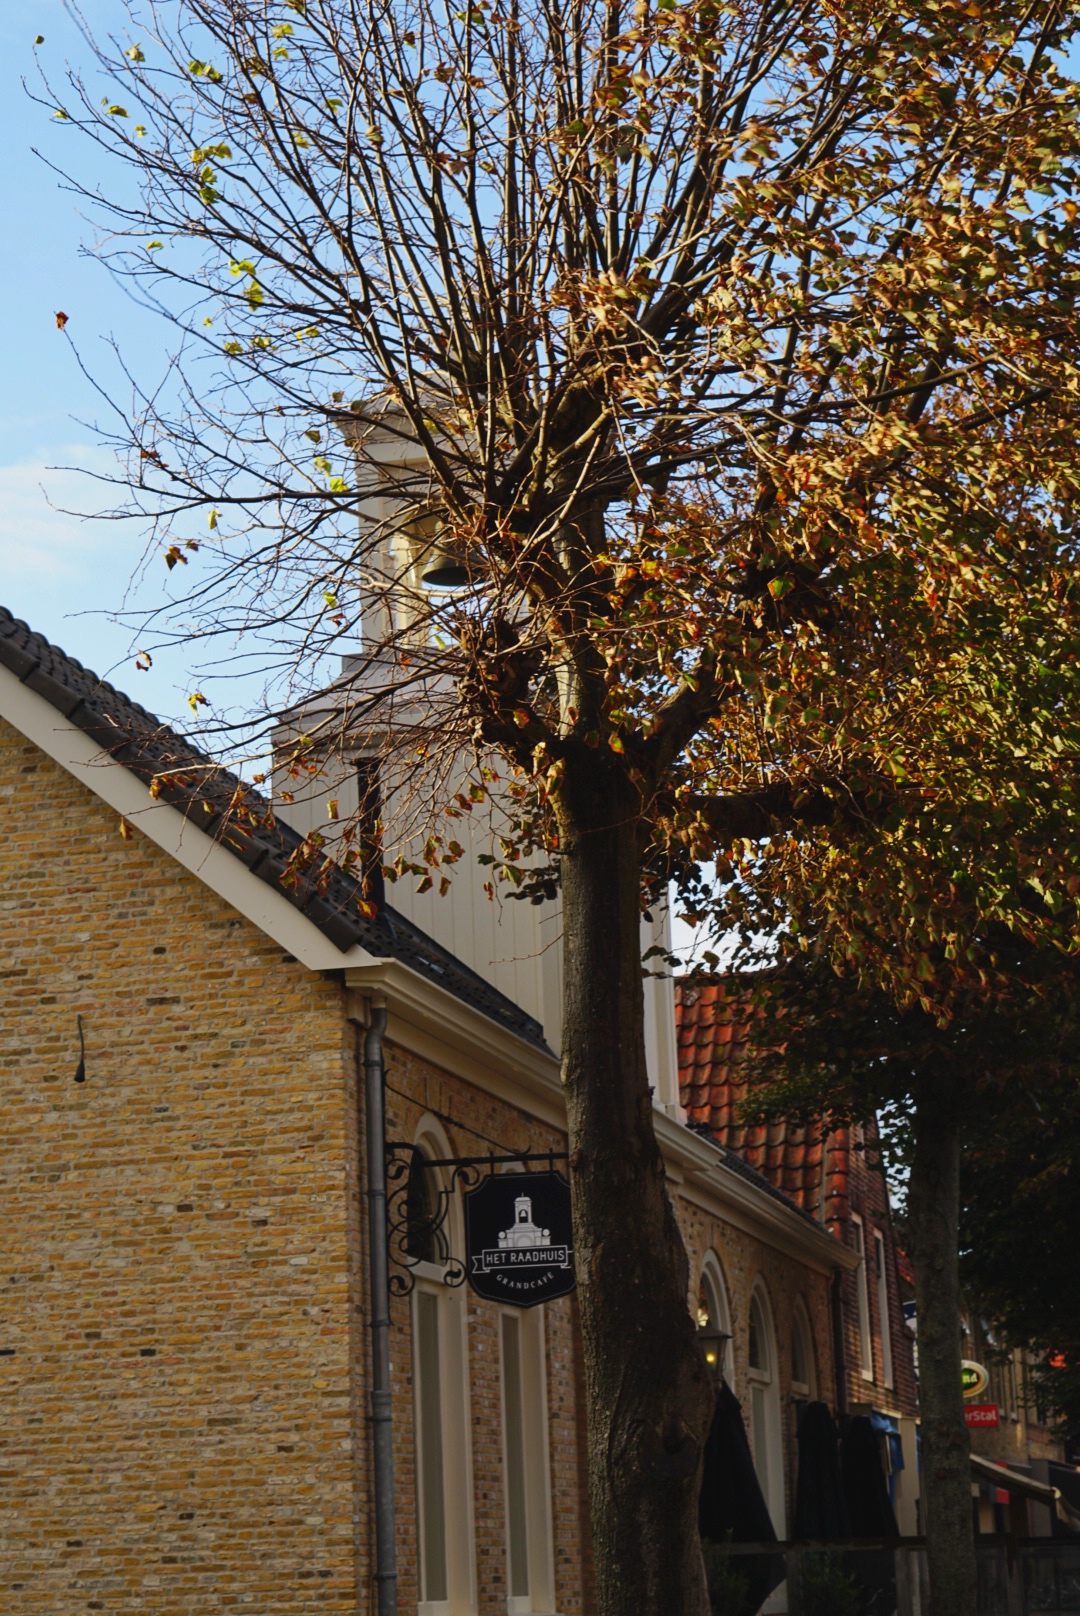 TravelRebel - Sustainable Tourism - The Netherlands - Terschelling